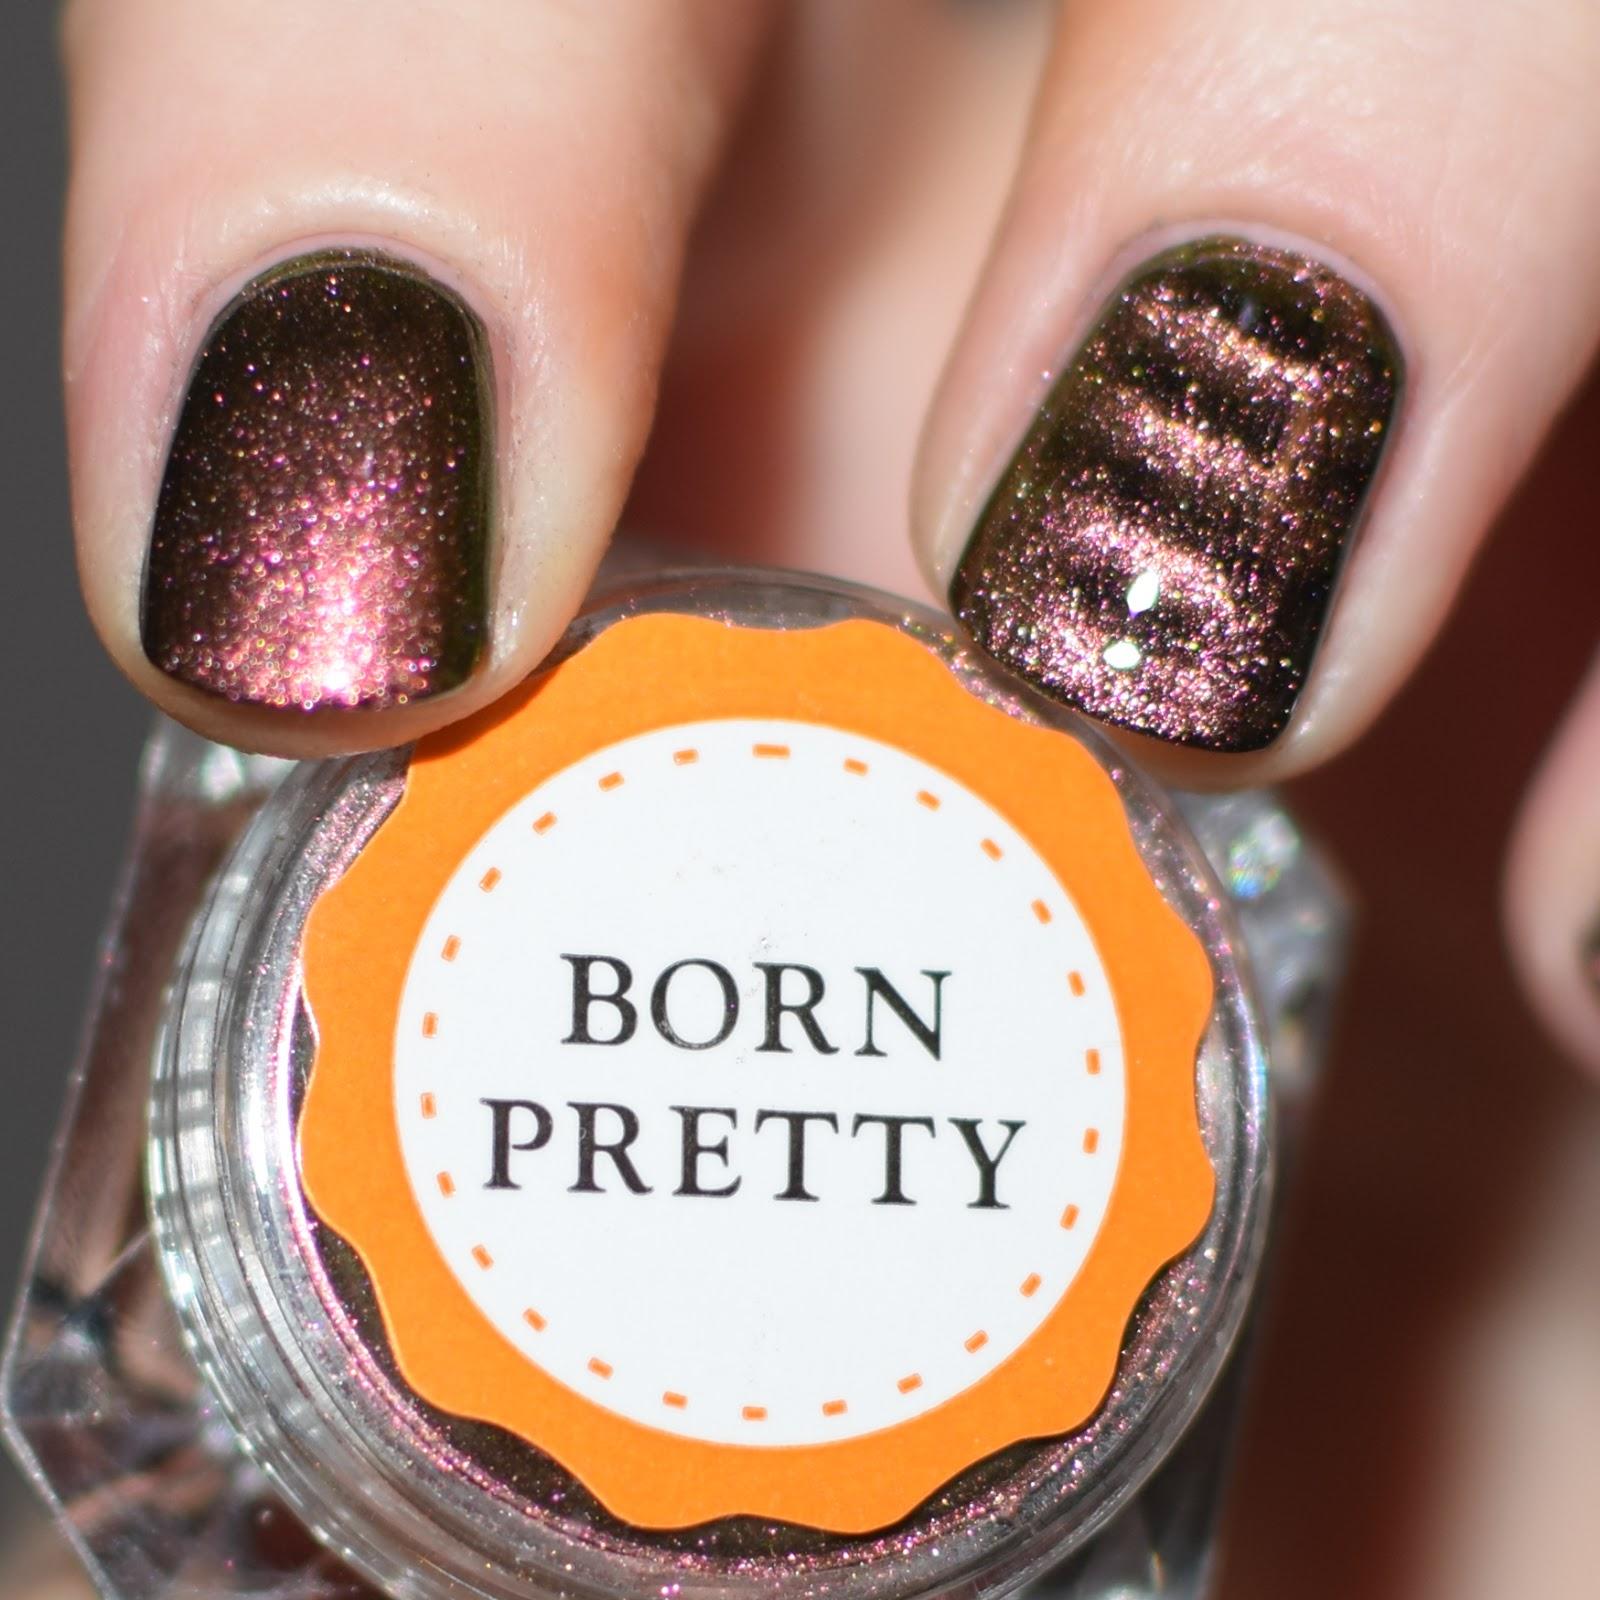 Born Pretty Chameleon Magnetic Nail Powder // Swatch & Review + Demo ...